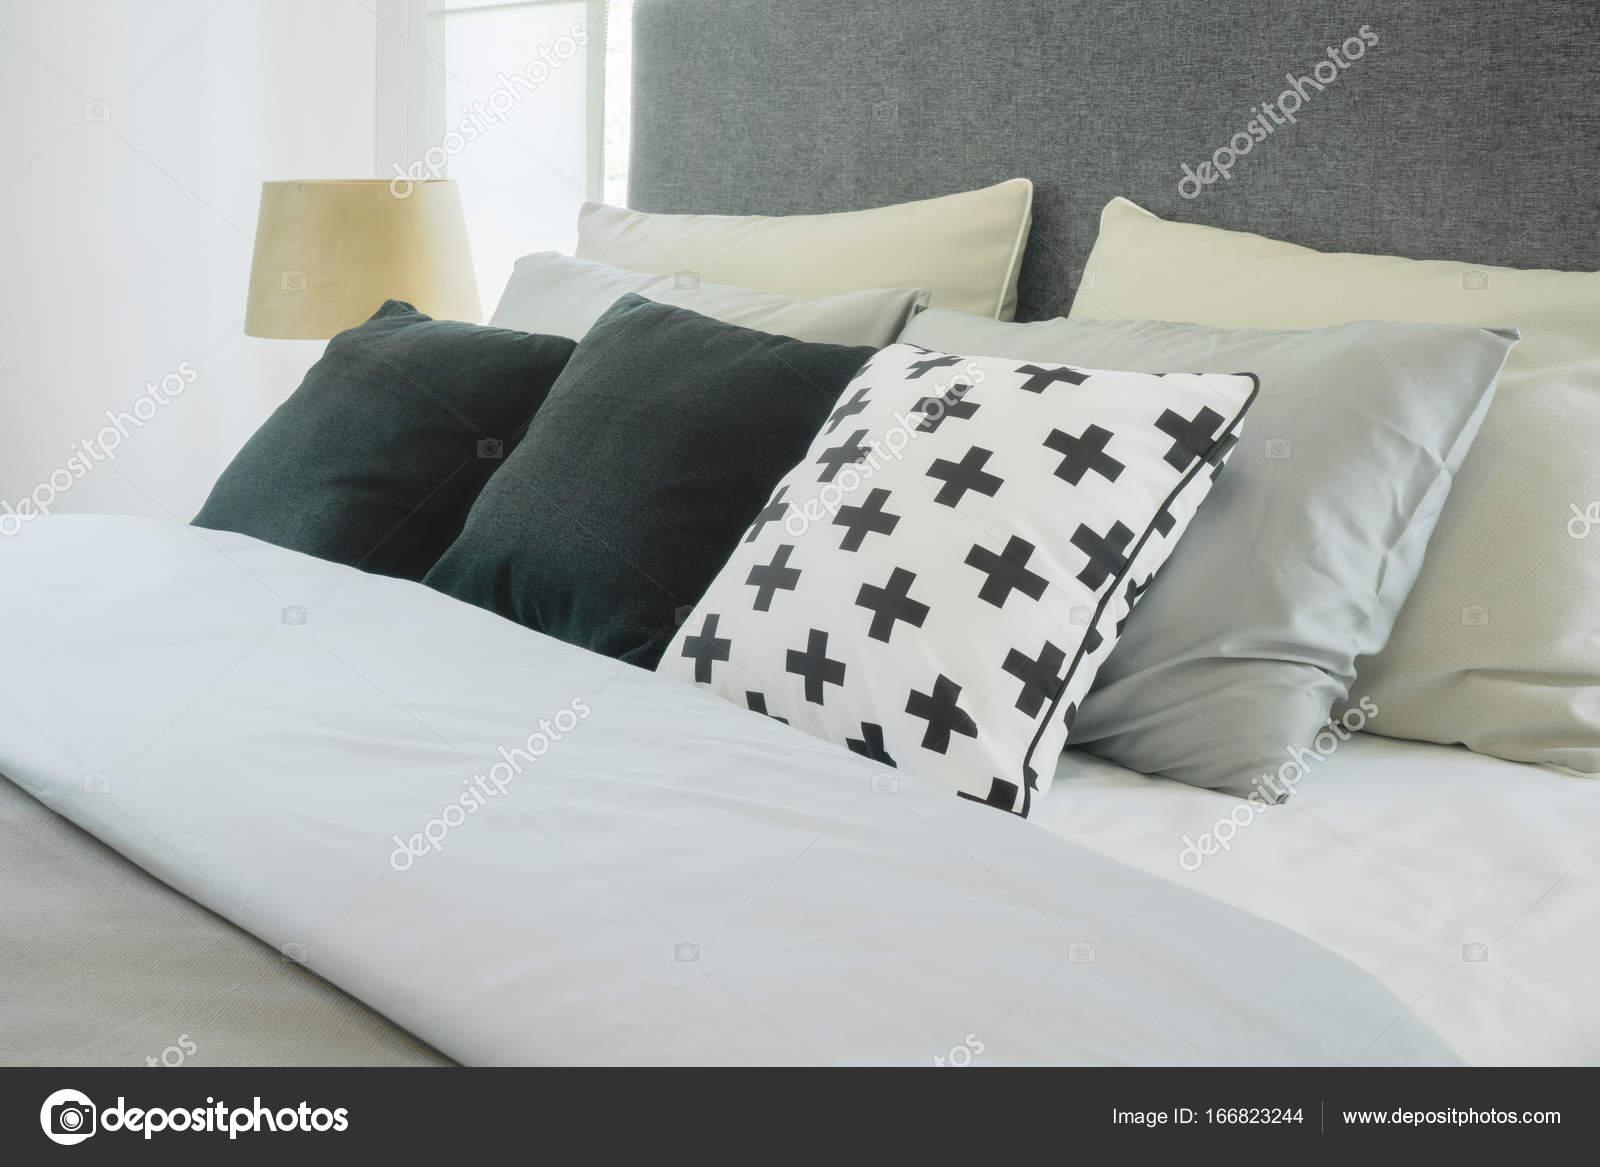 https://st3.depositphotos.com/6200870/16682/i/1600/depositphotos_166823244-stockafbeelding-moderne-slaapkamer-interieur-met-kussens.jpg